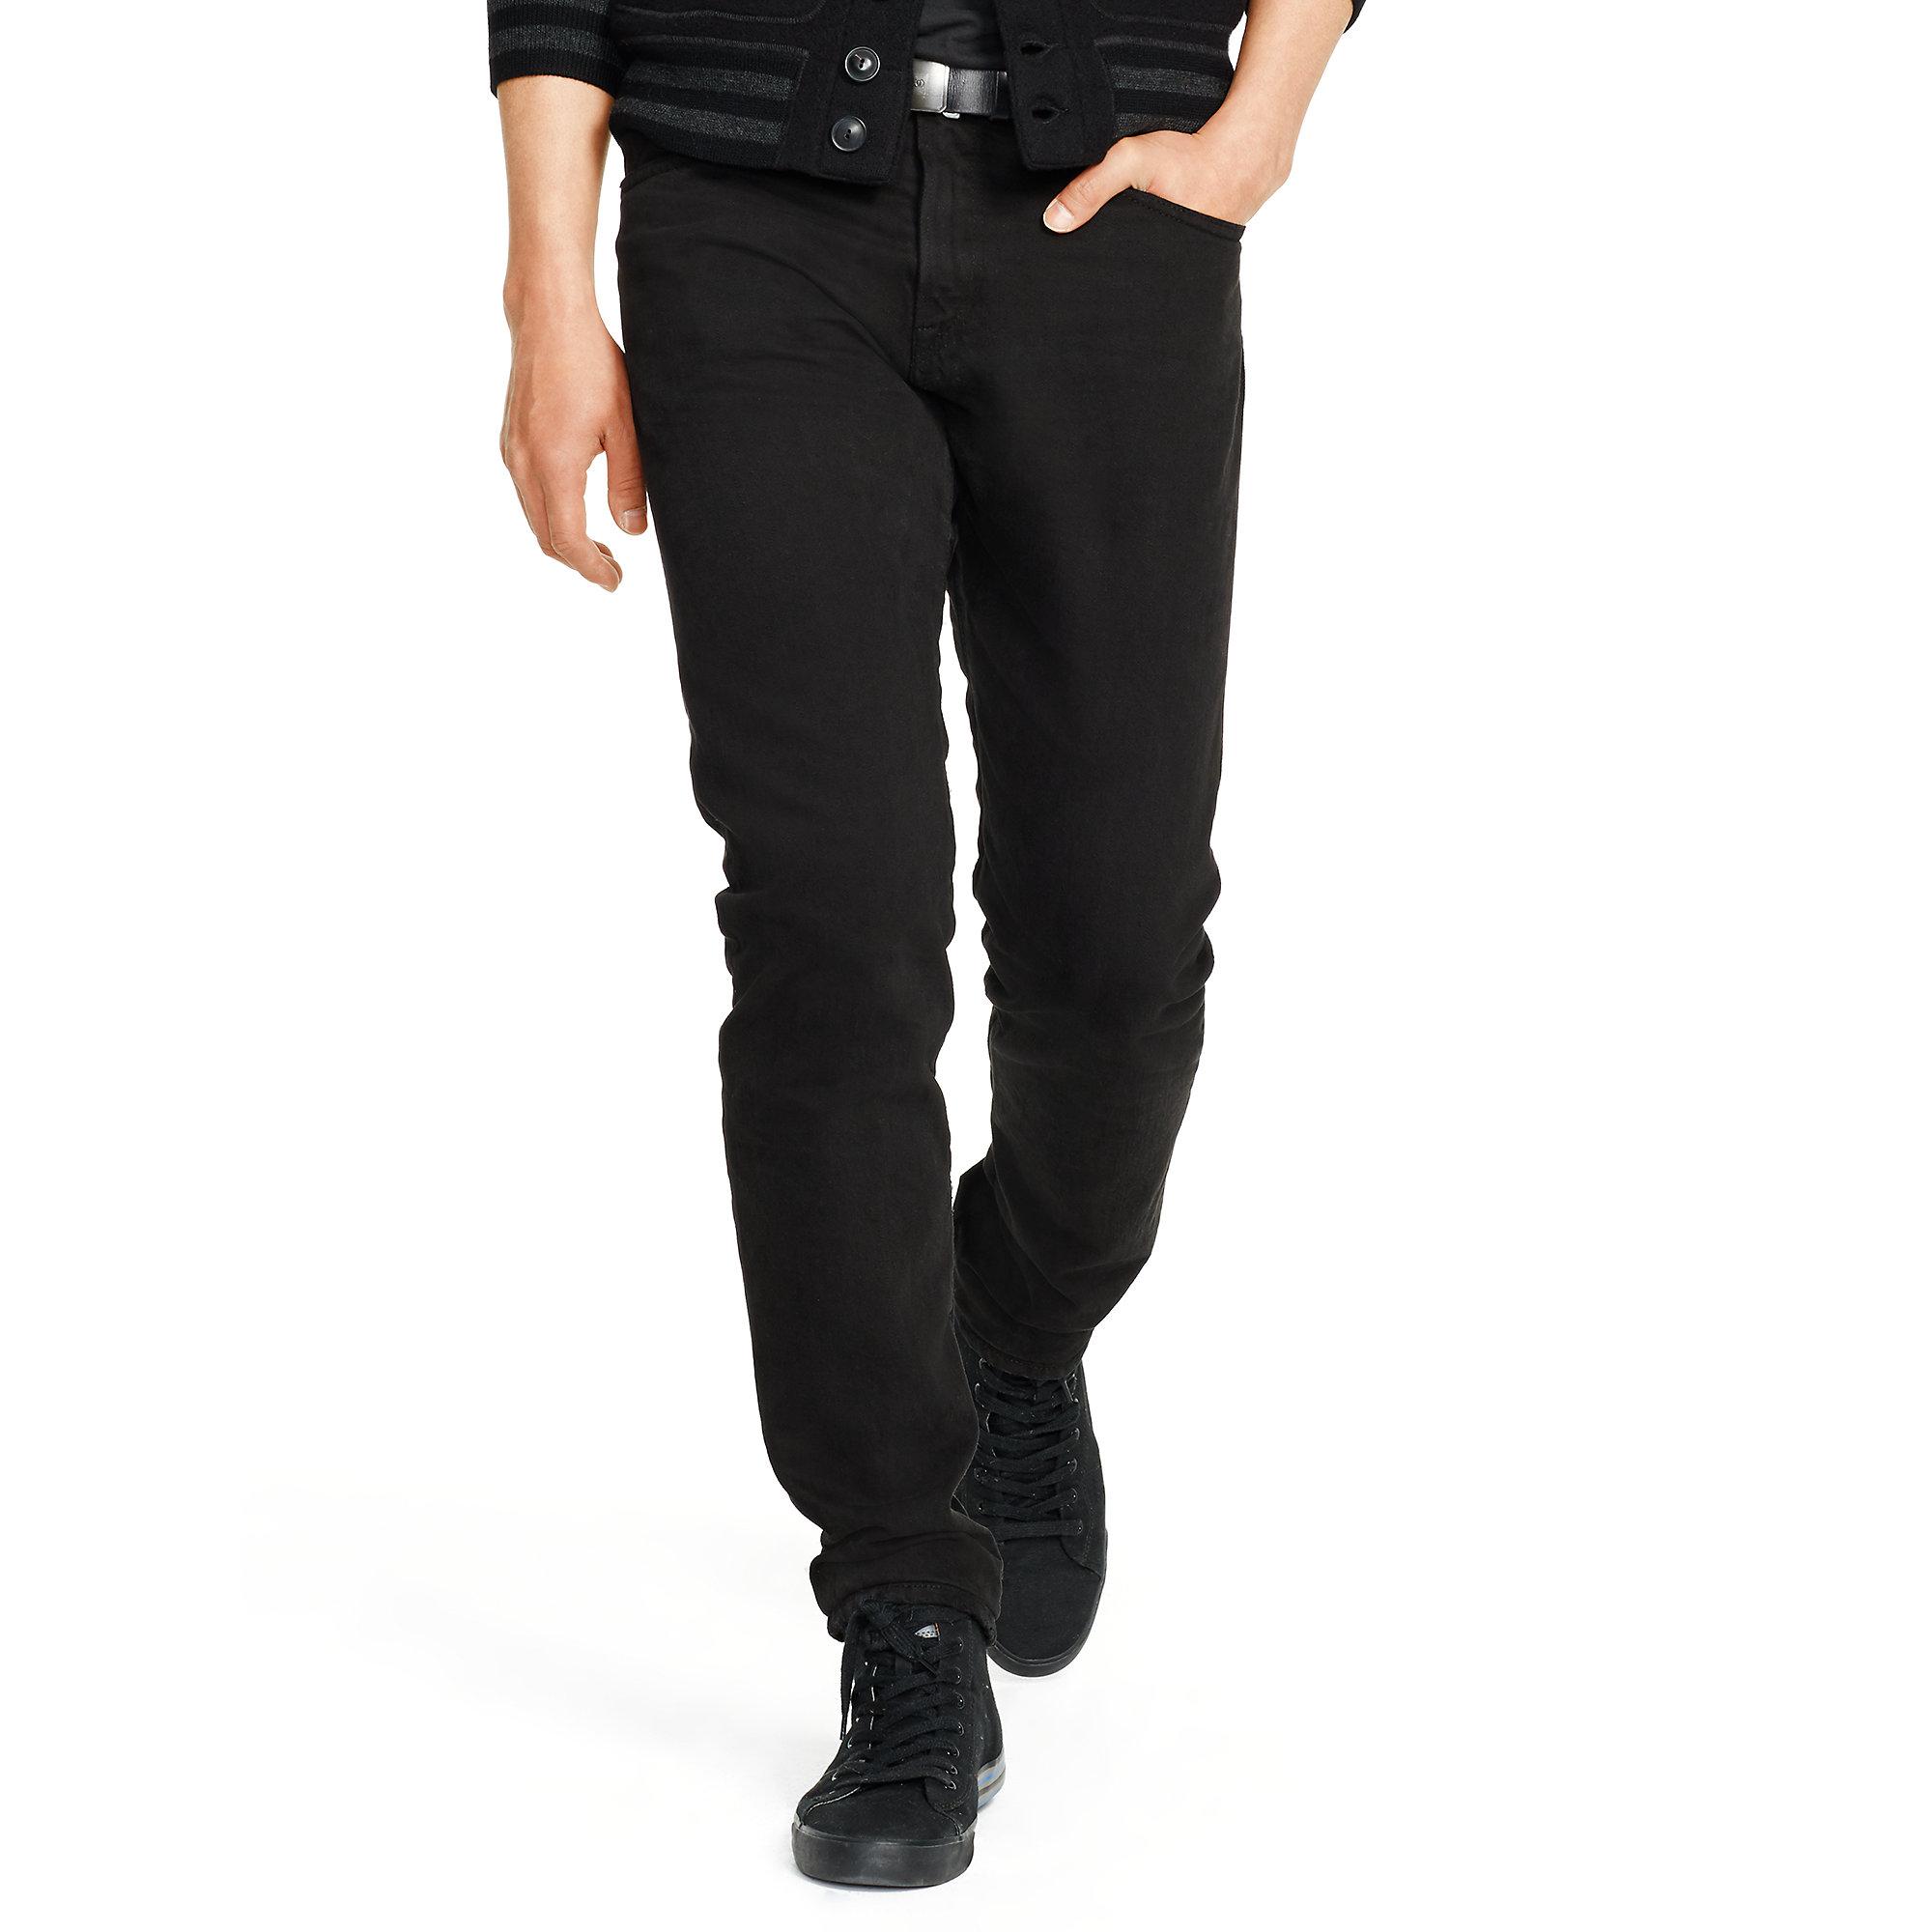 polo ralph lauren sullivan slim fit jean in black for men. Black Bedroom Furniture Sets. Home Design Ideas